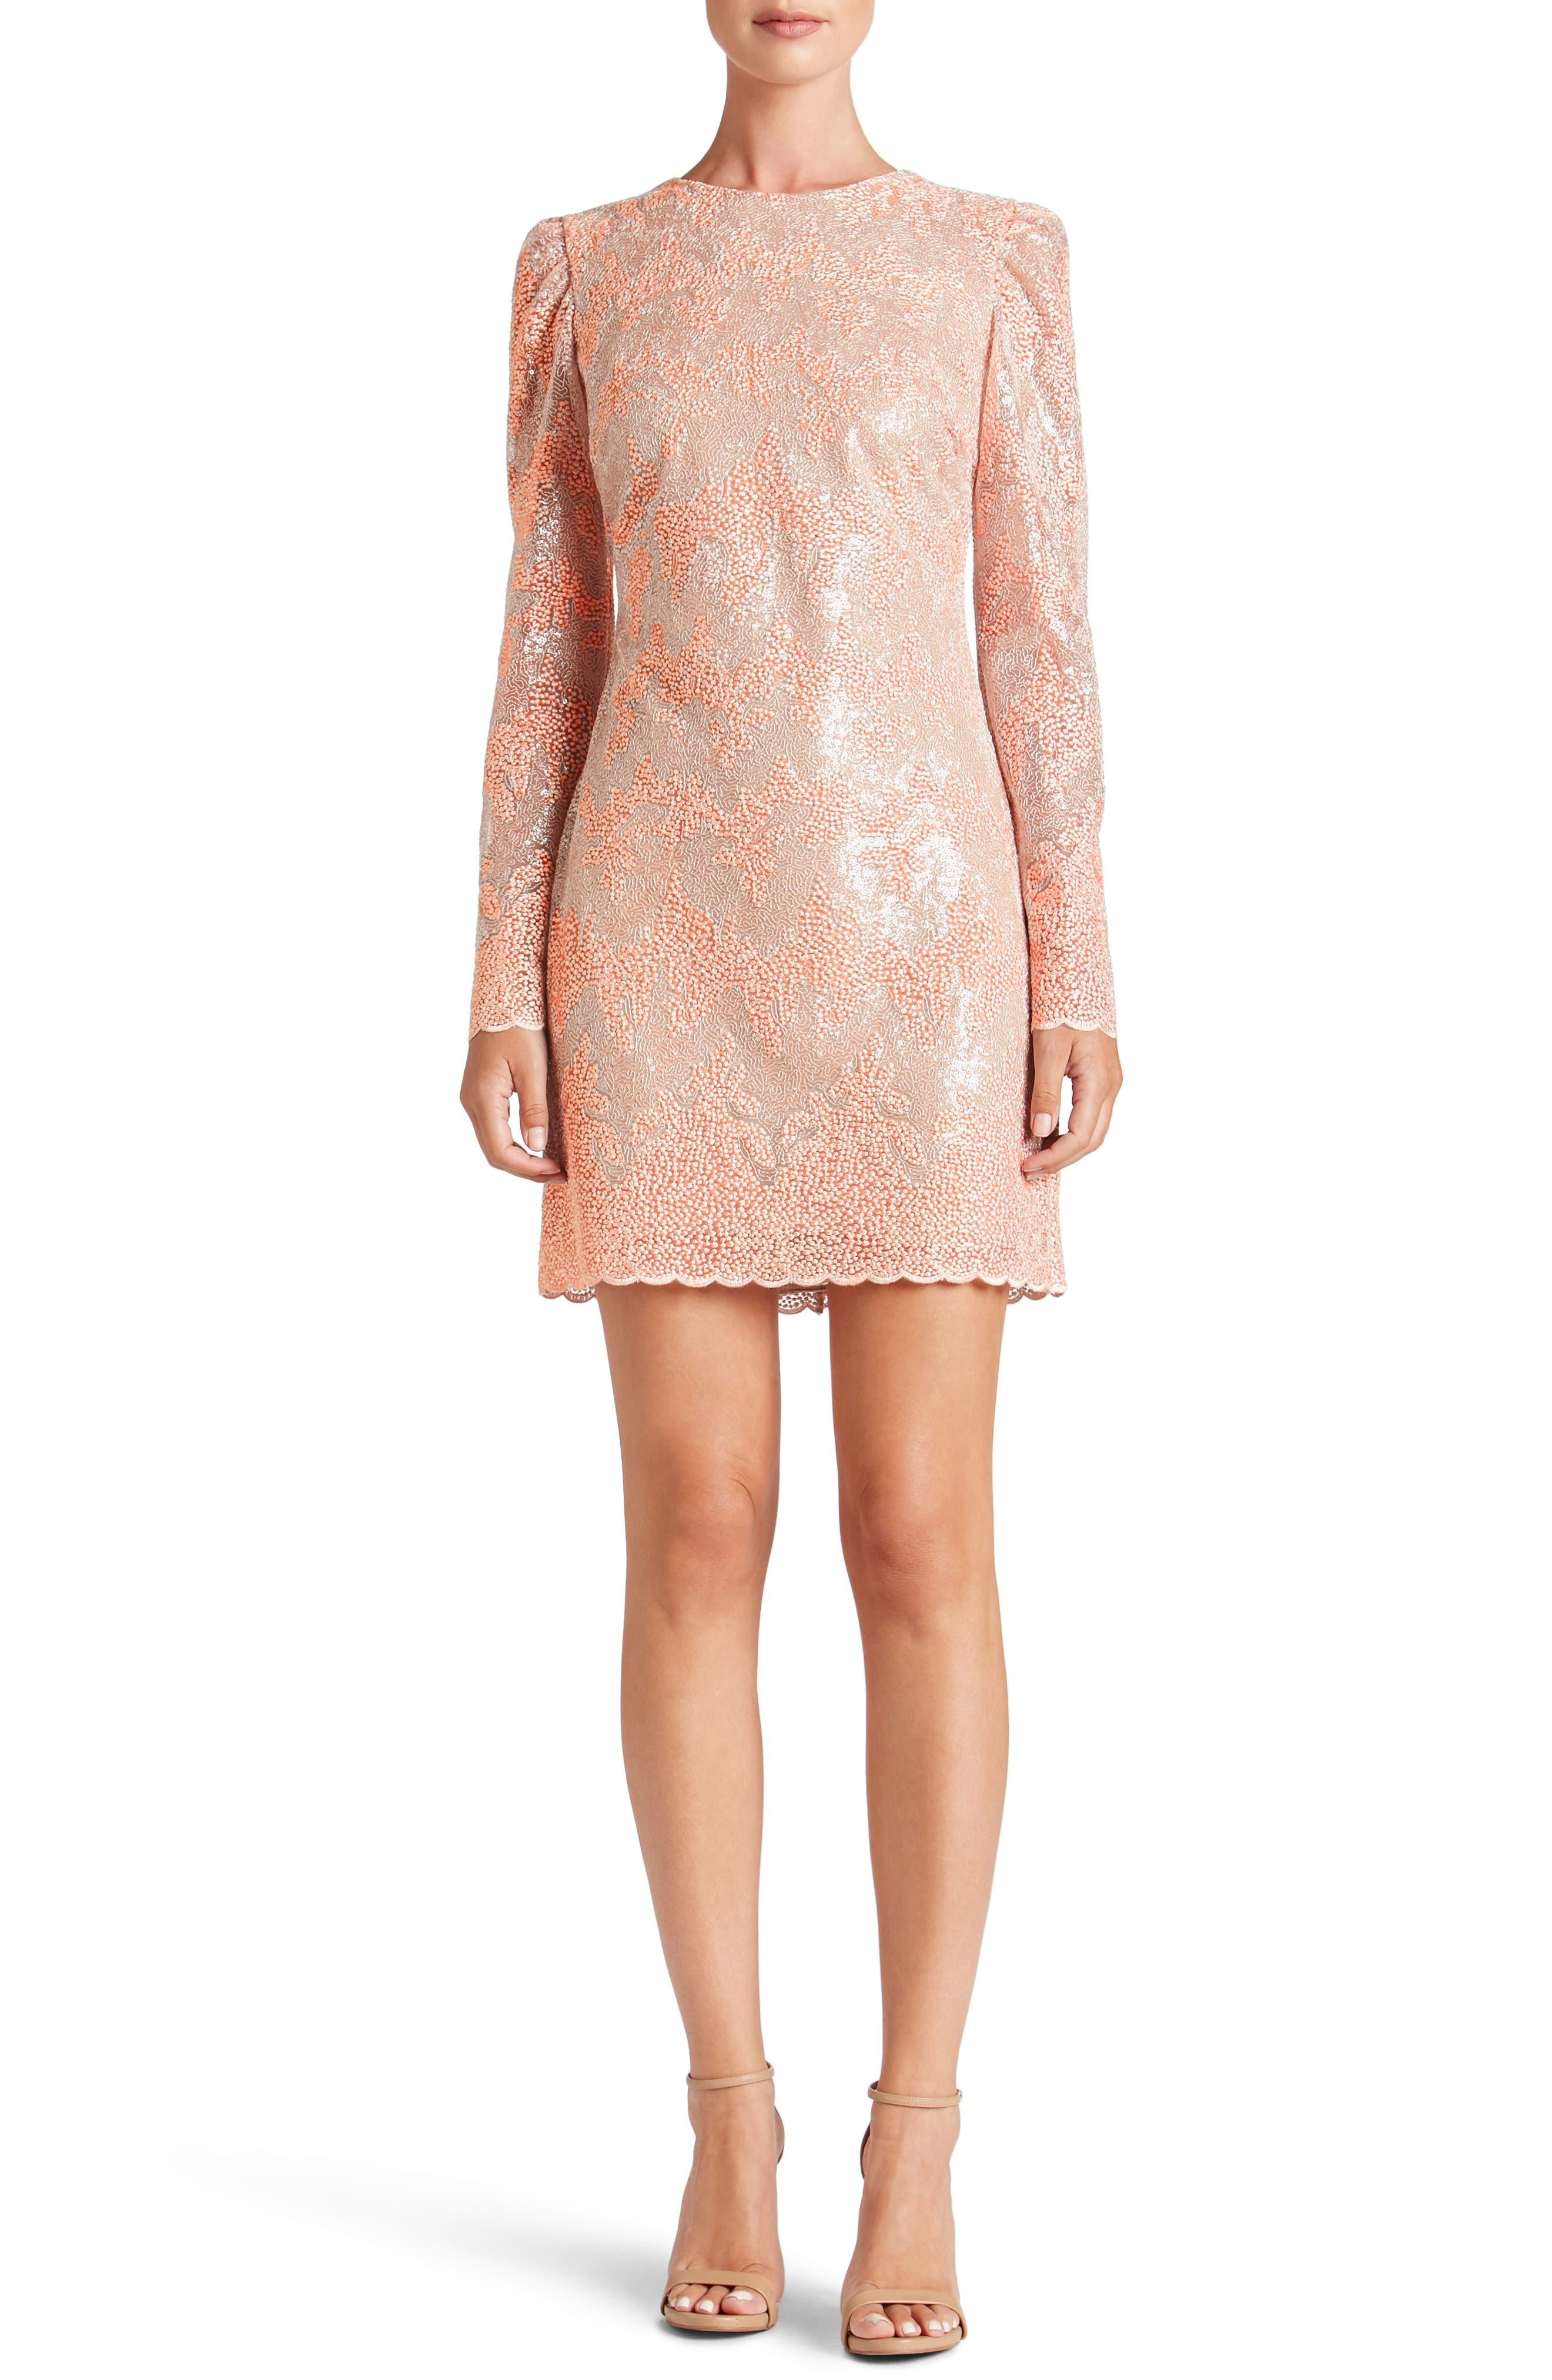 Main Image - Dress the Population Aubry Sequin Embellished Shift Dress